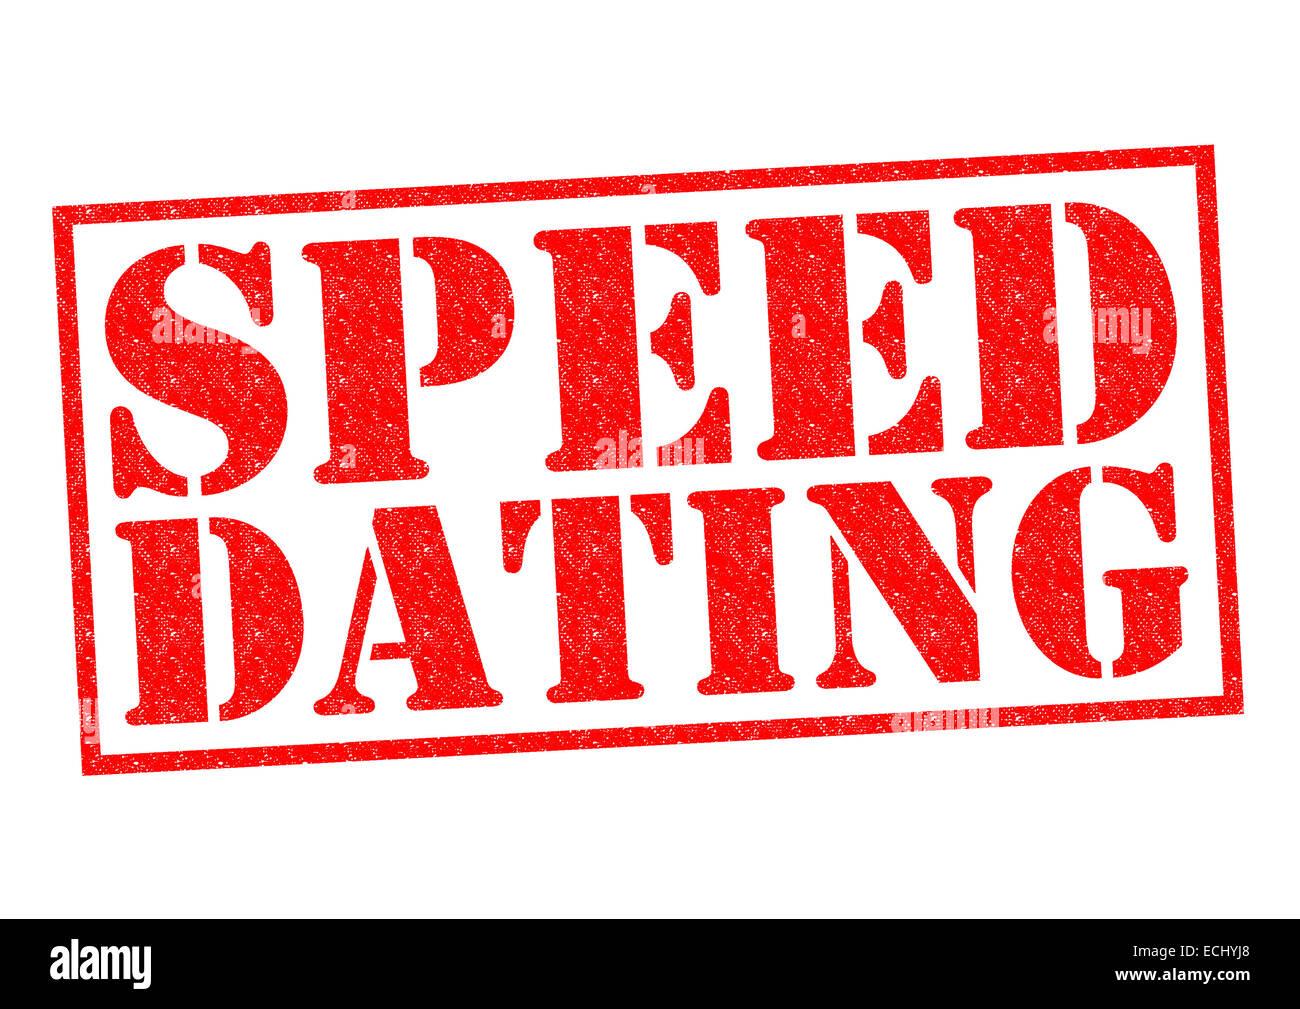 Online-Dating fГјr Studierende